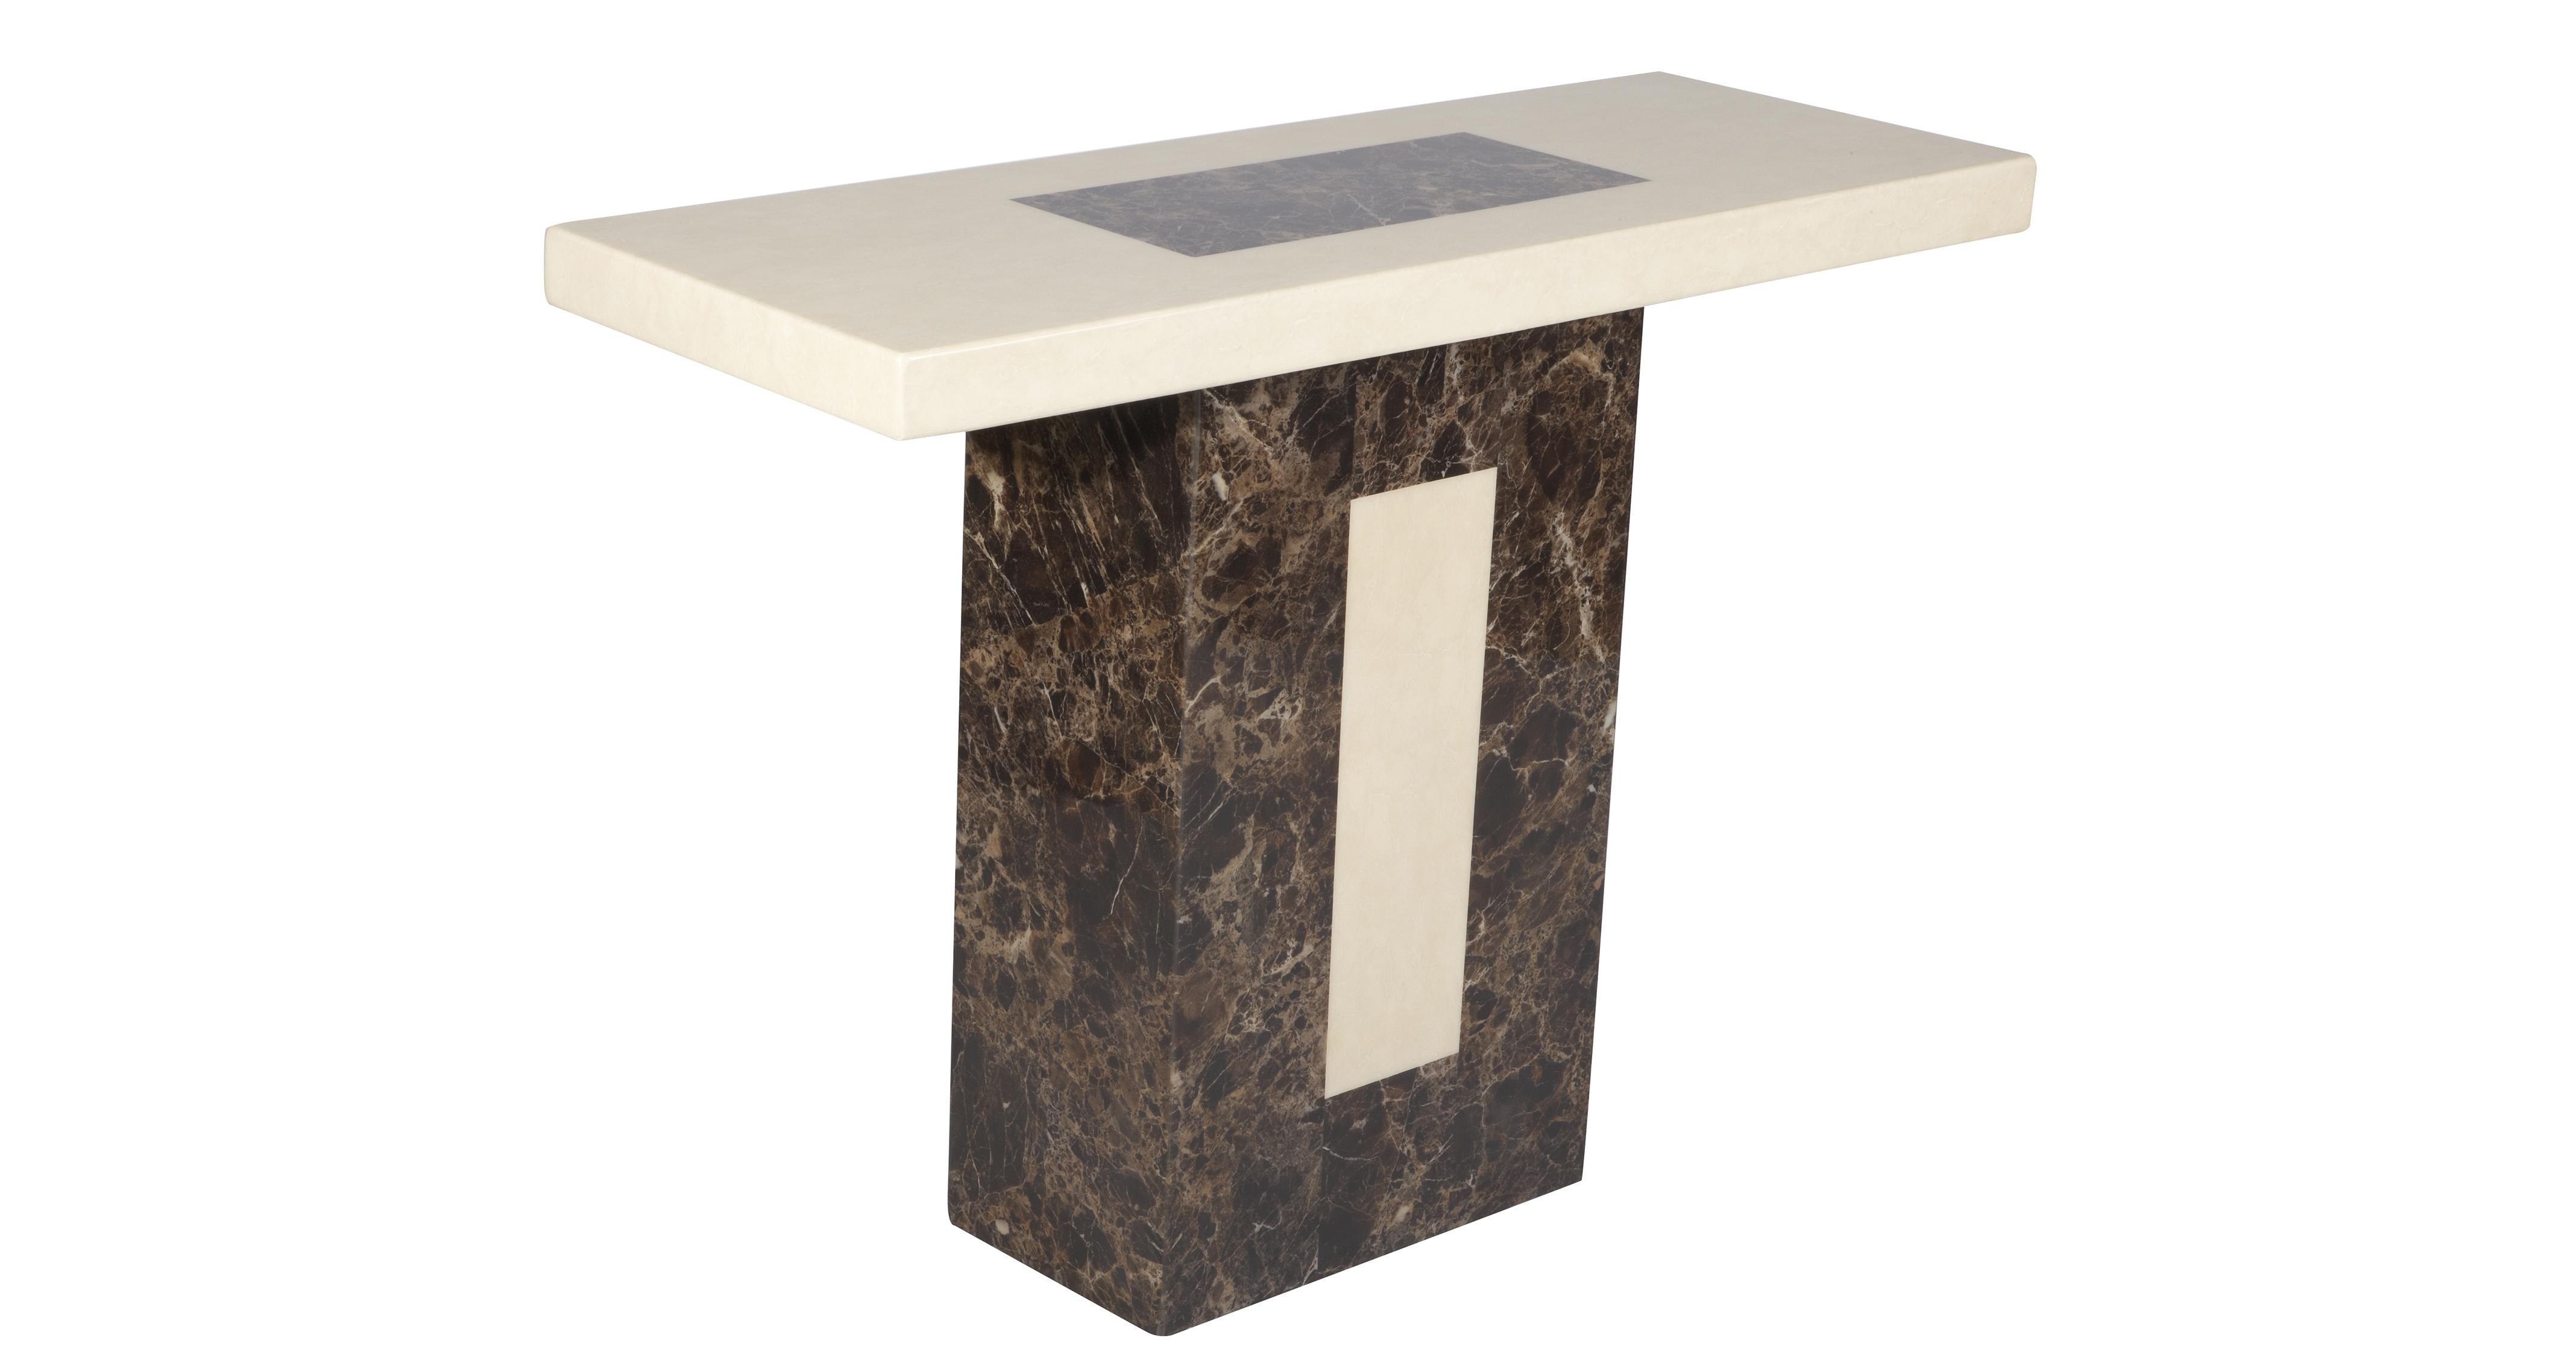 f patine ciale furniture black top sp noir glass edition avec gueridon w marble ed marbre speciale pedestal en table verre facon plateau marly like collection